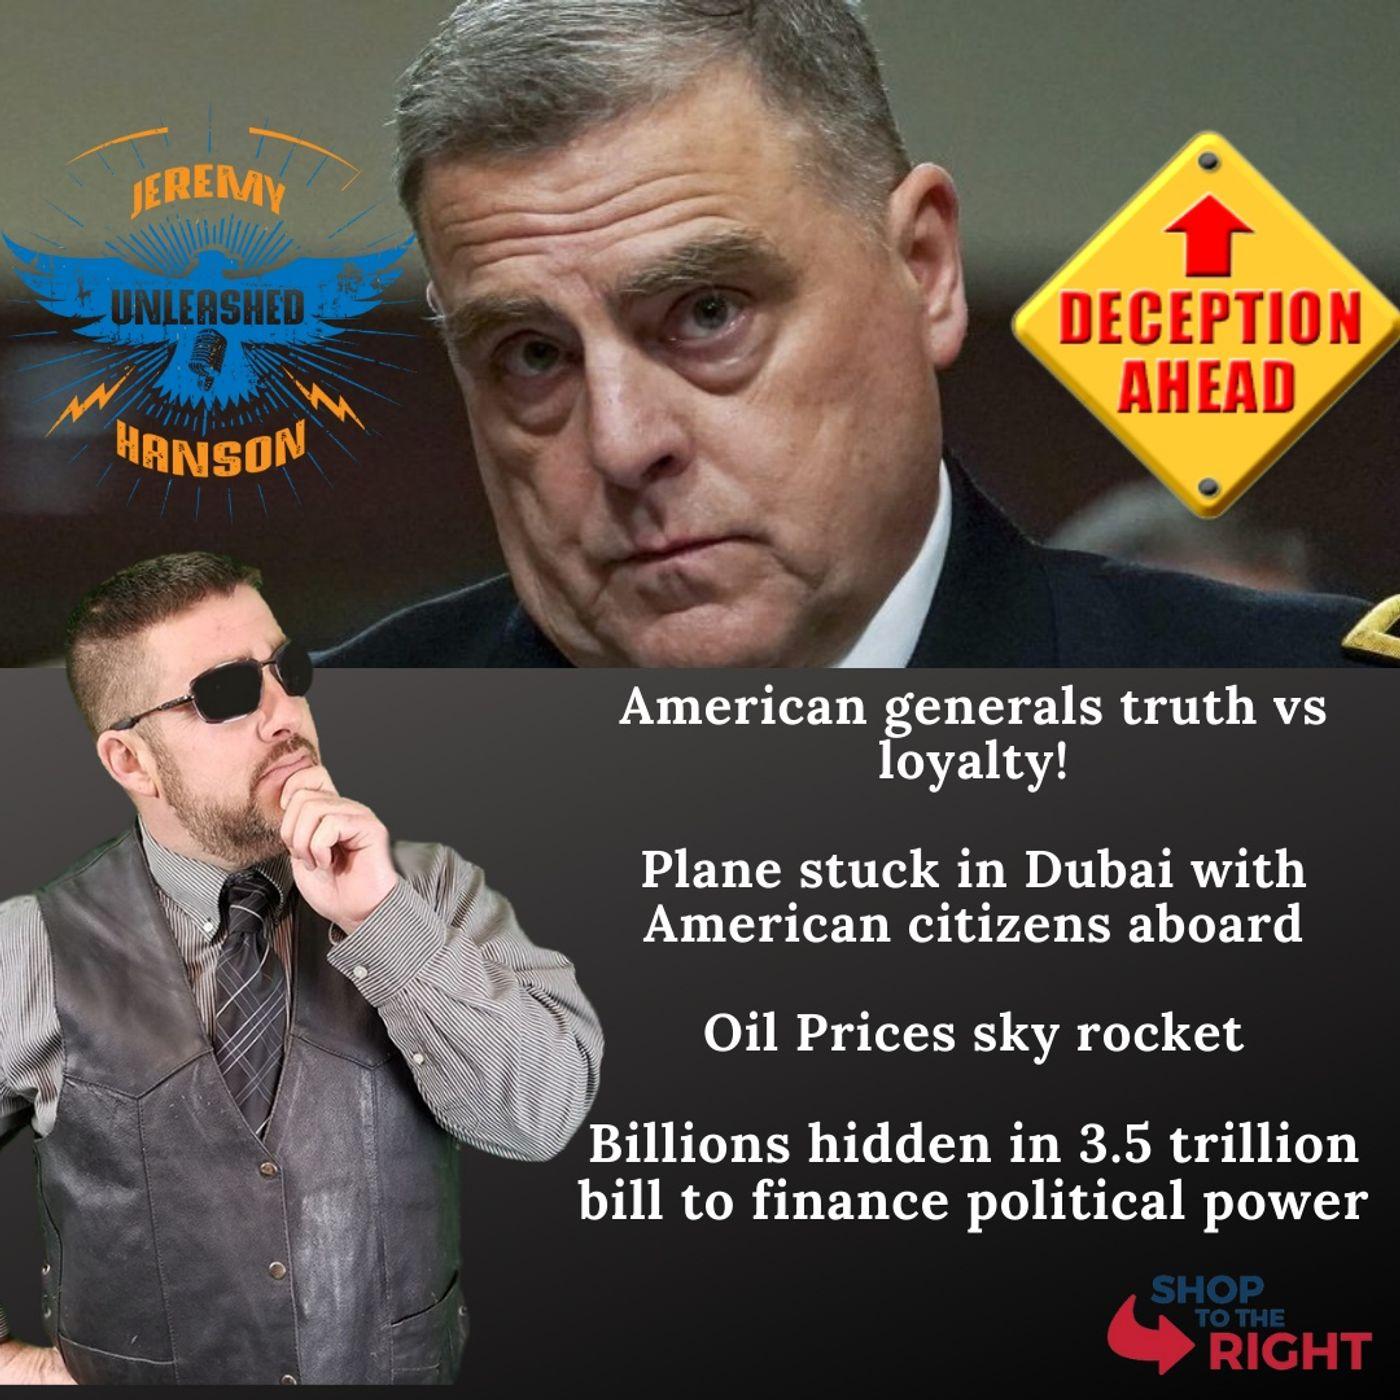 Unleashed Jeremy Hanson 9/29/21  Bombshell 3.5 trillion dollar bill has 90 billion for community organizers and political operatives